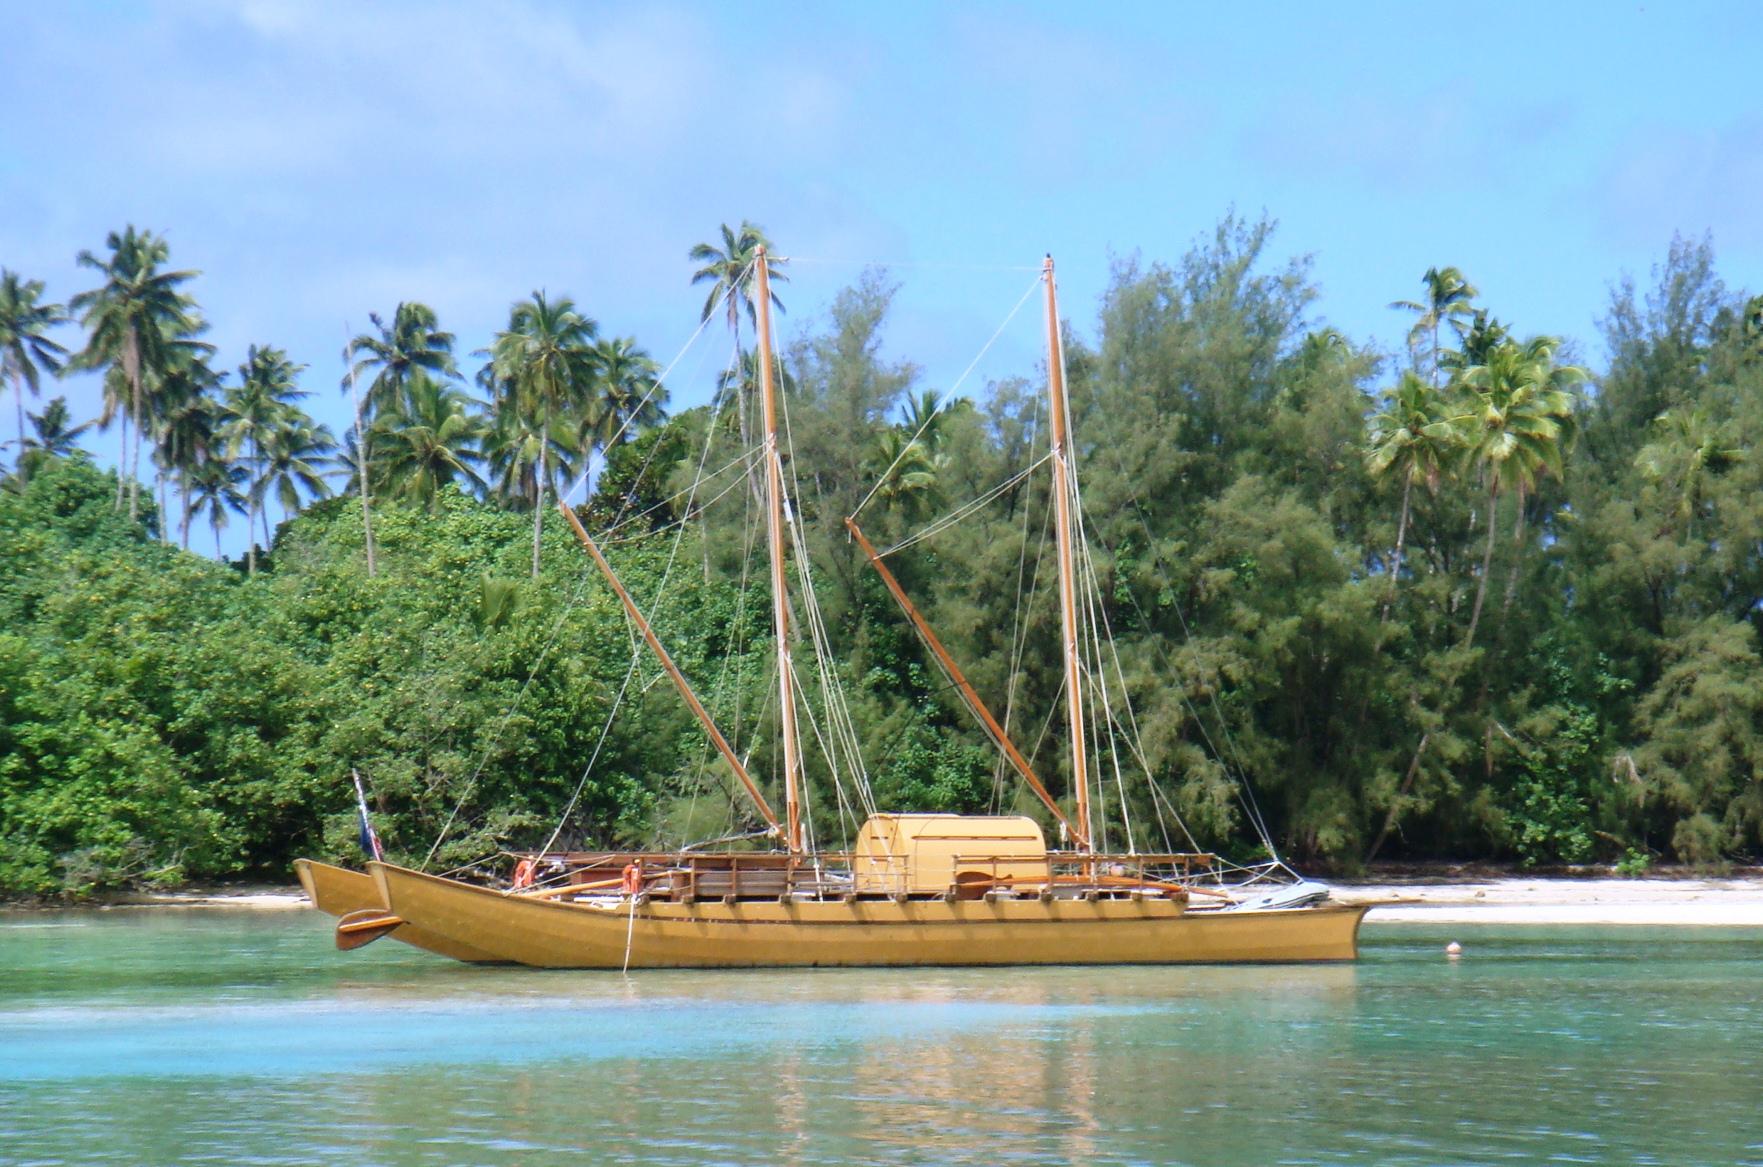 Double_hulled_vaka,_Rarotonga_2010.jpg